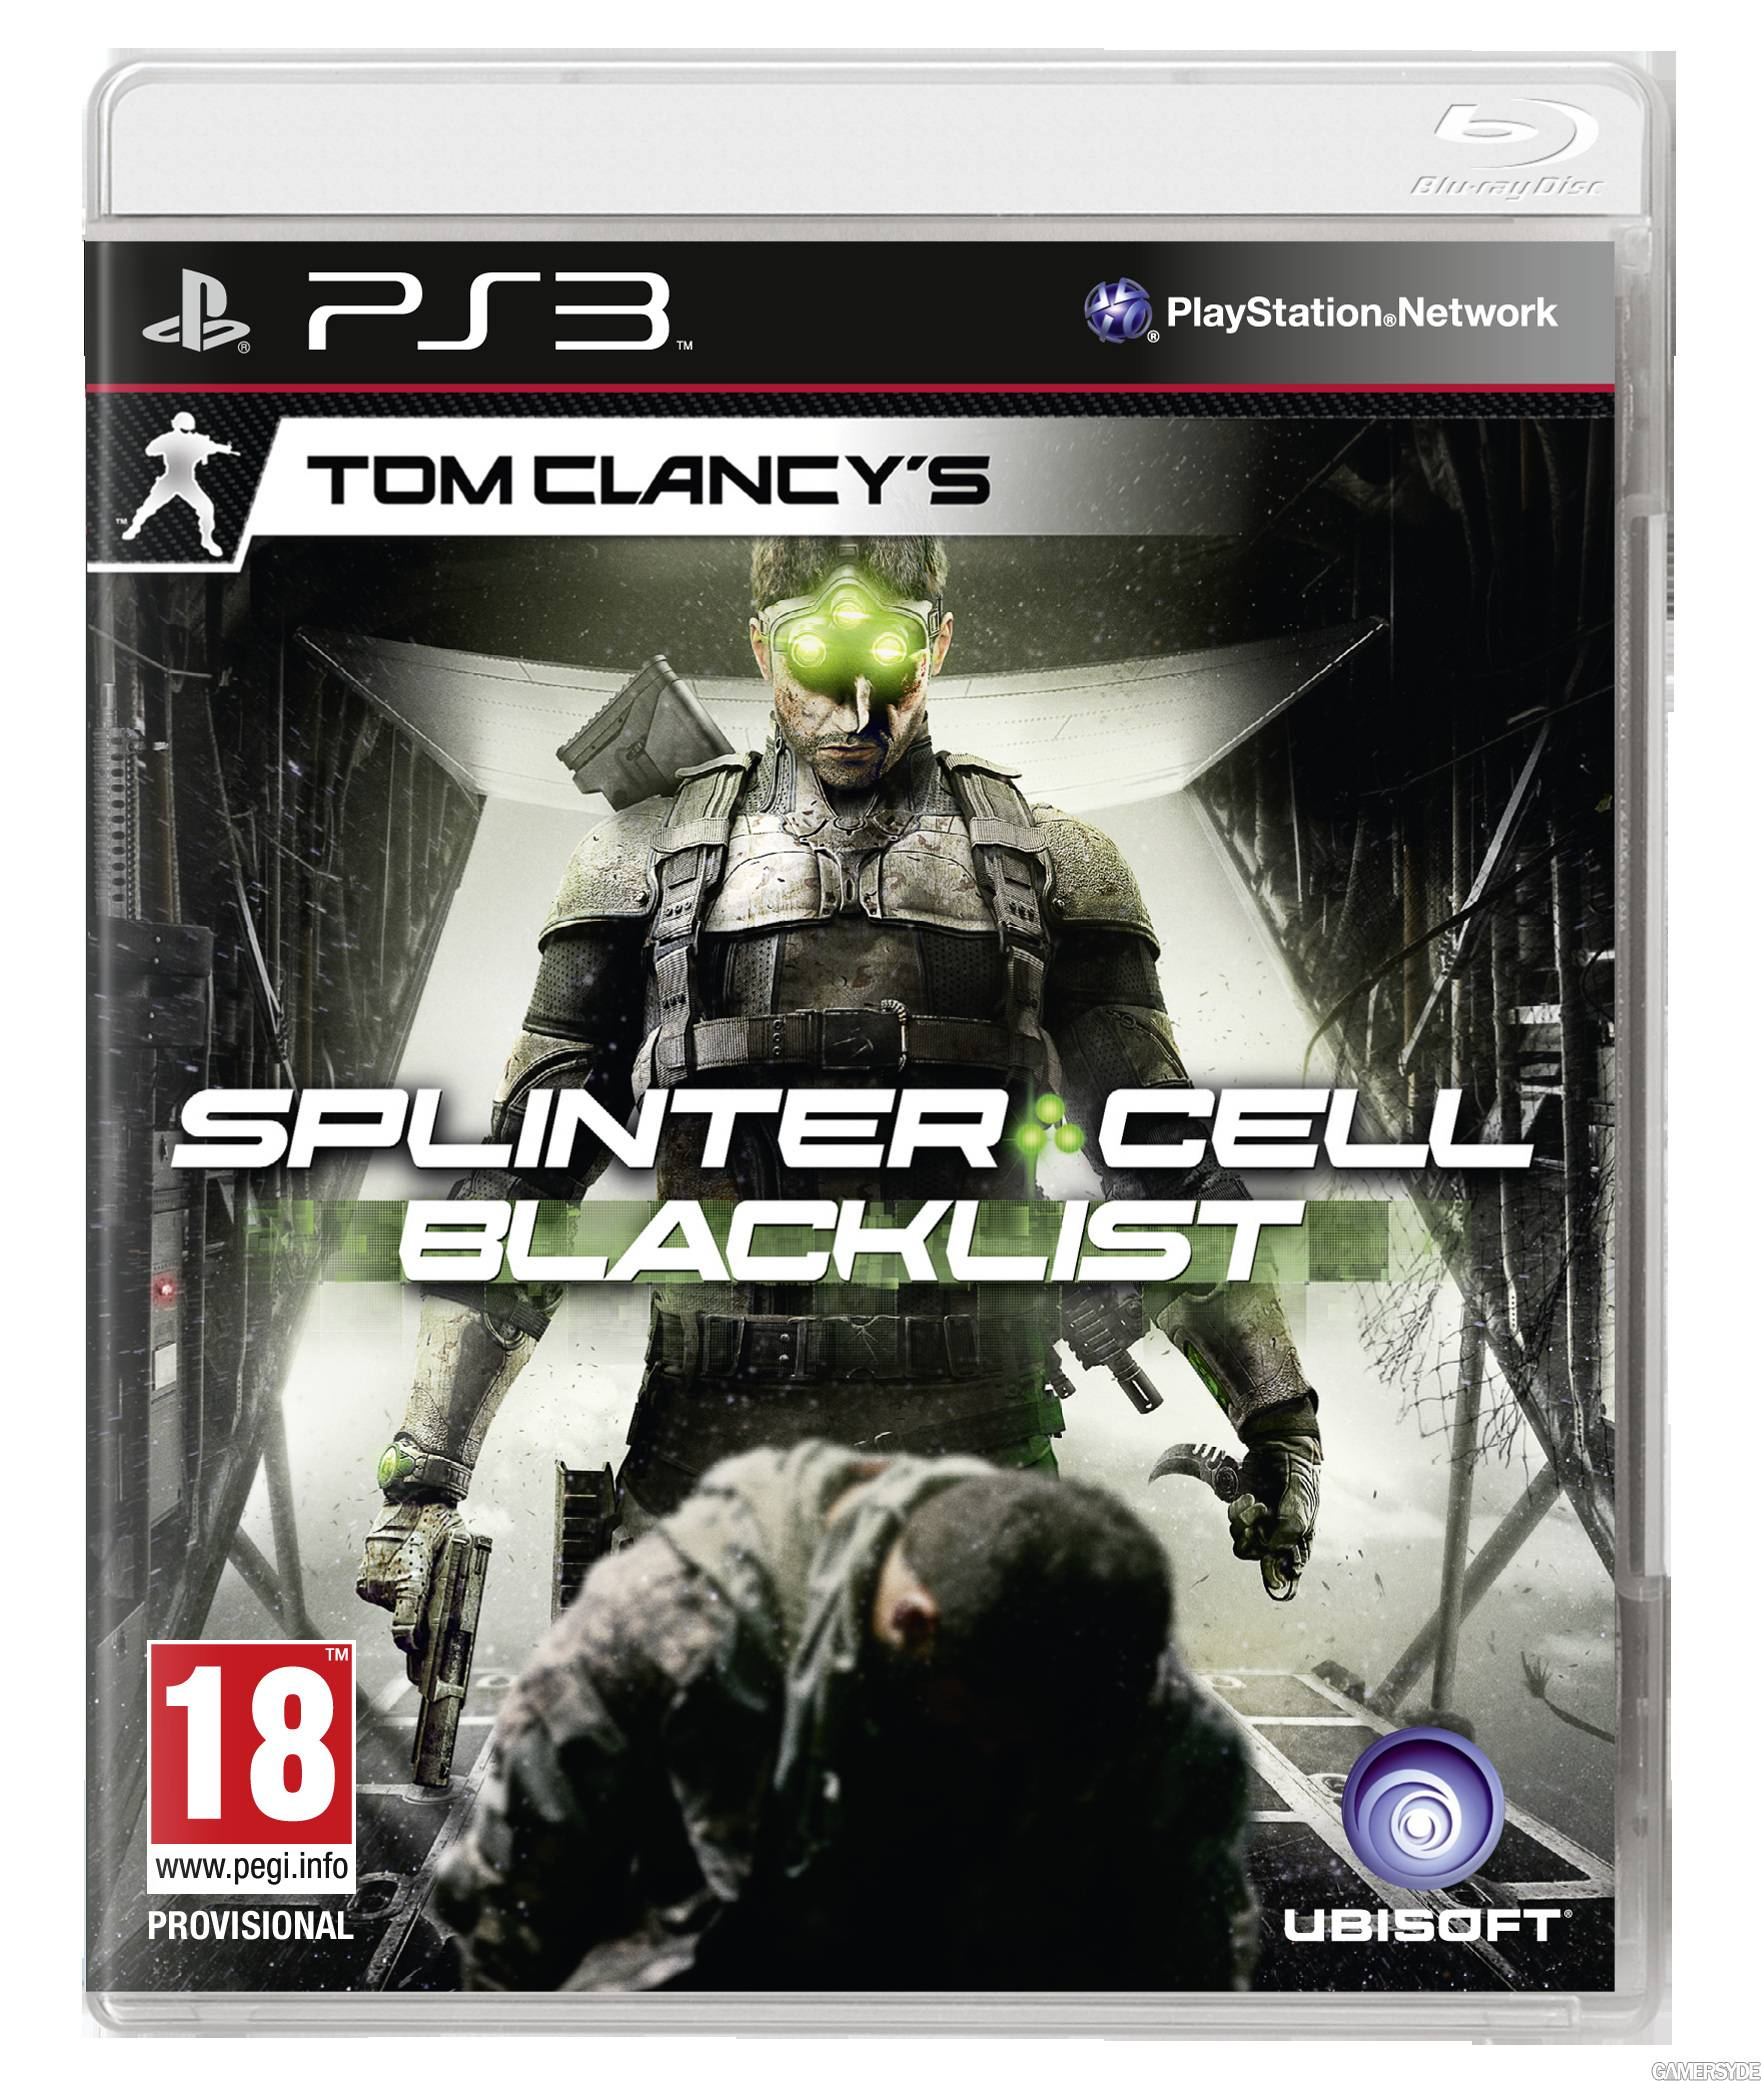 Tom clancy's splinter cell blacklist 65996